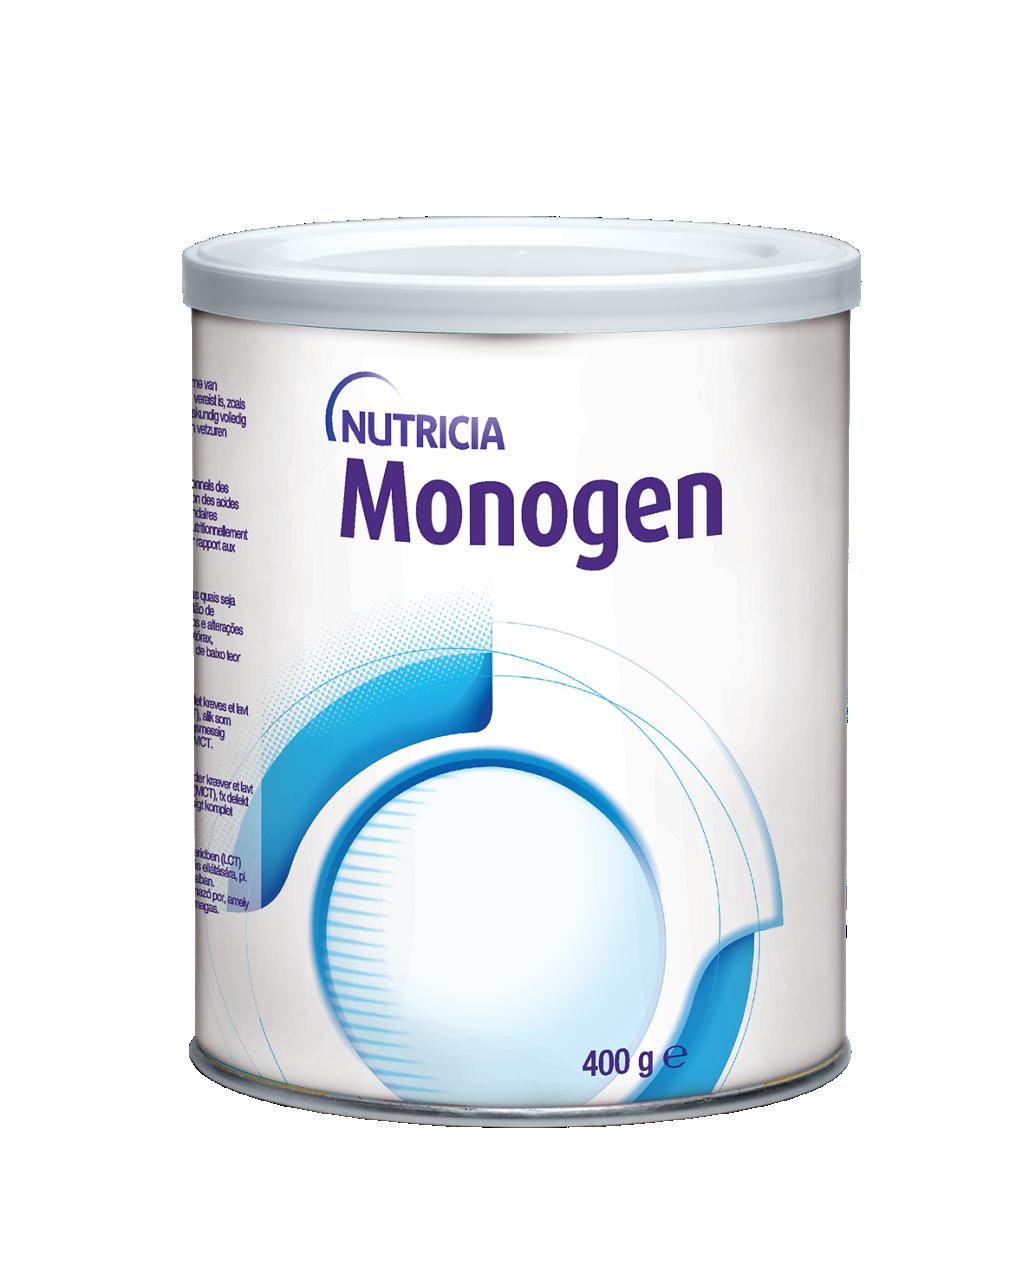 metabolics-monagen-400g-tin-packshot.png